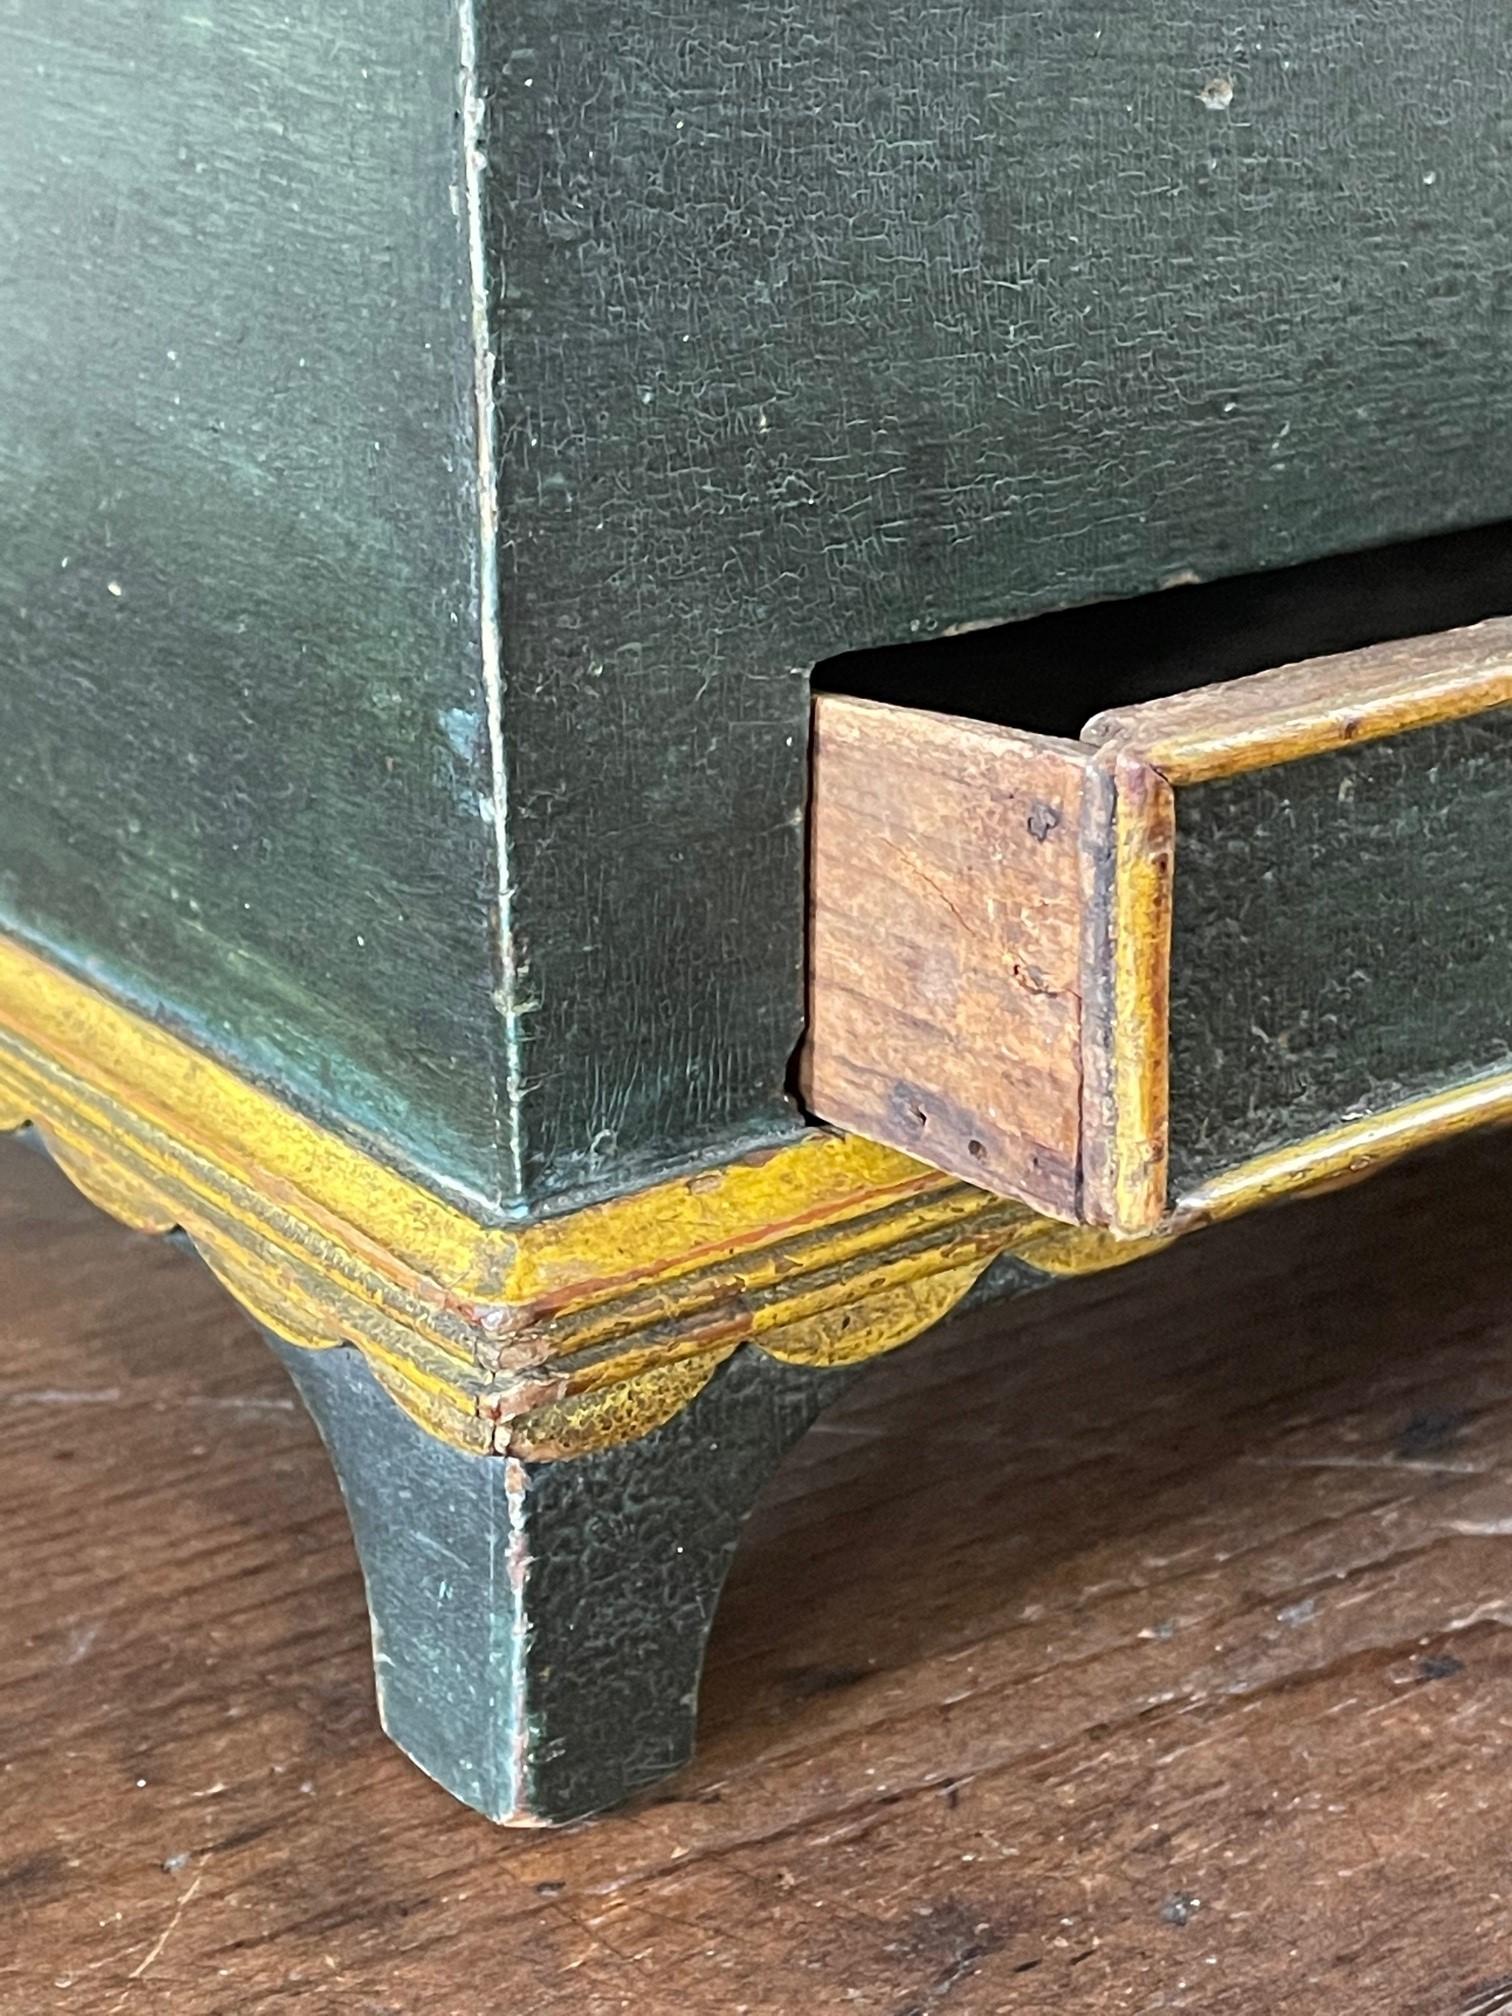 american painted dressing box rel=